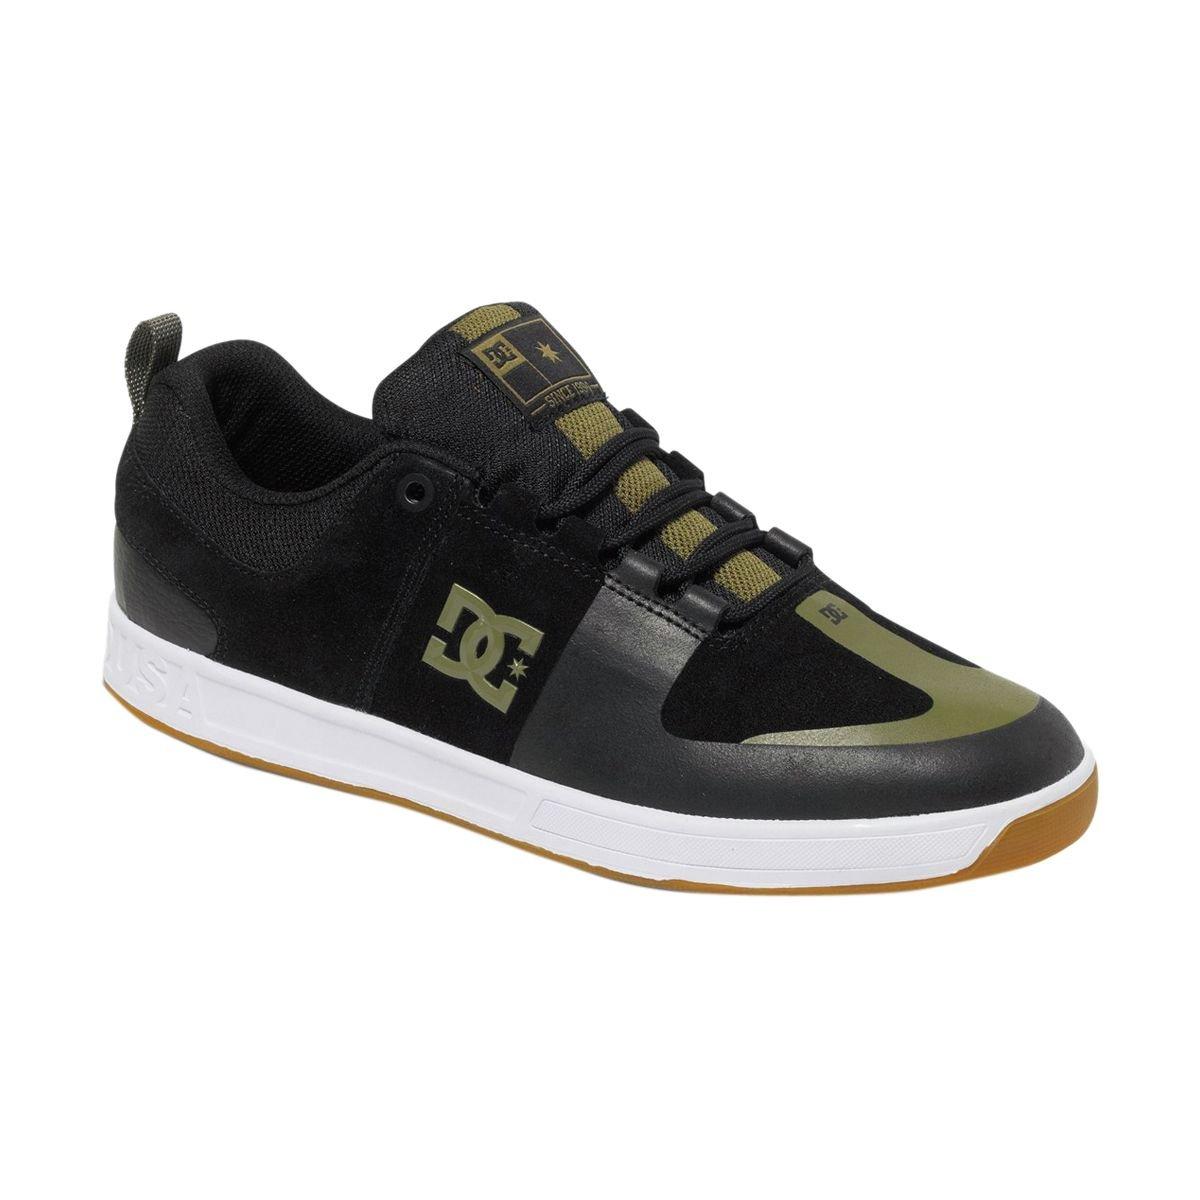 What Is The Best Price For DC Lynx Prestige S Skate Shoe Mens Black Black Gum 9 5